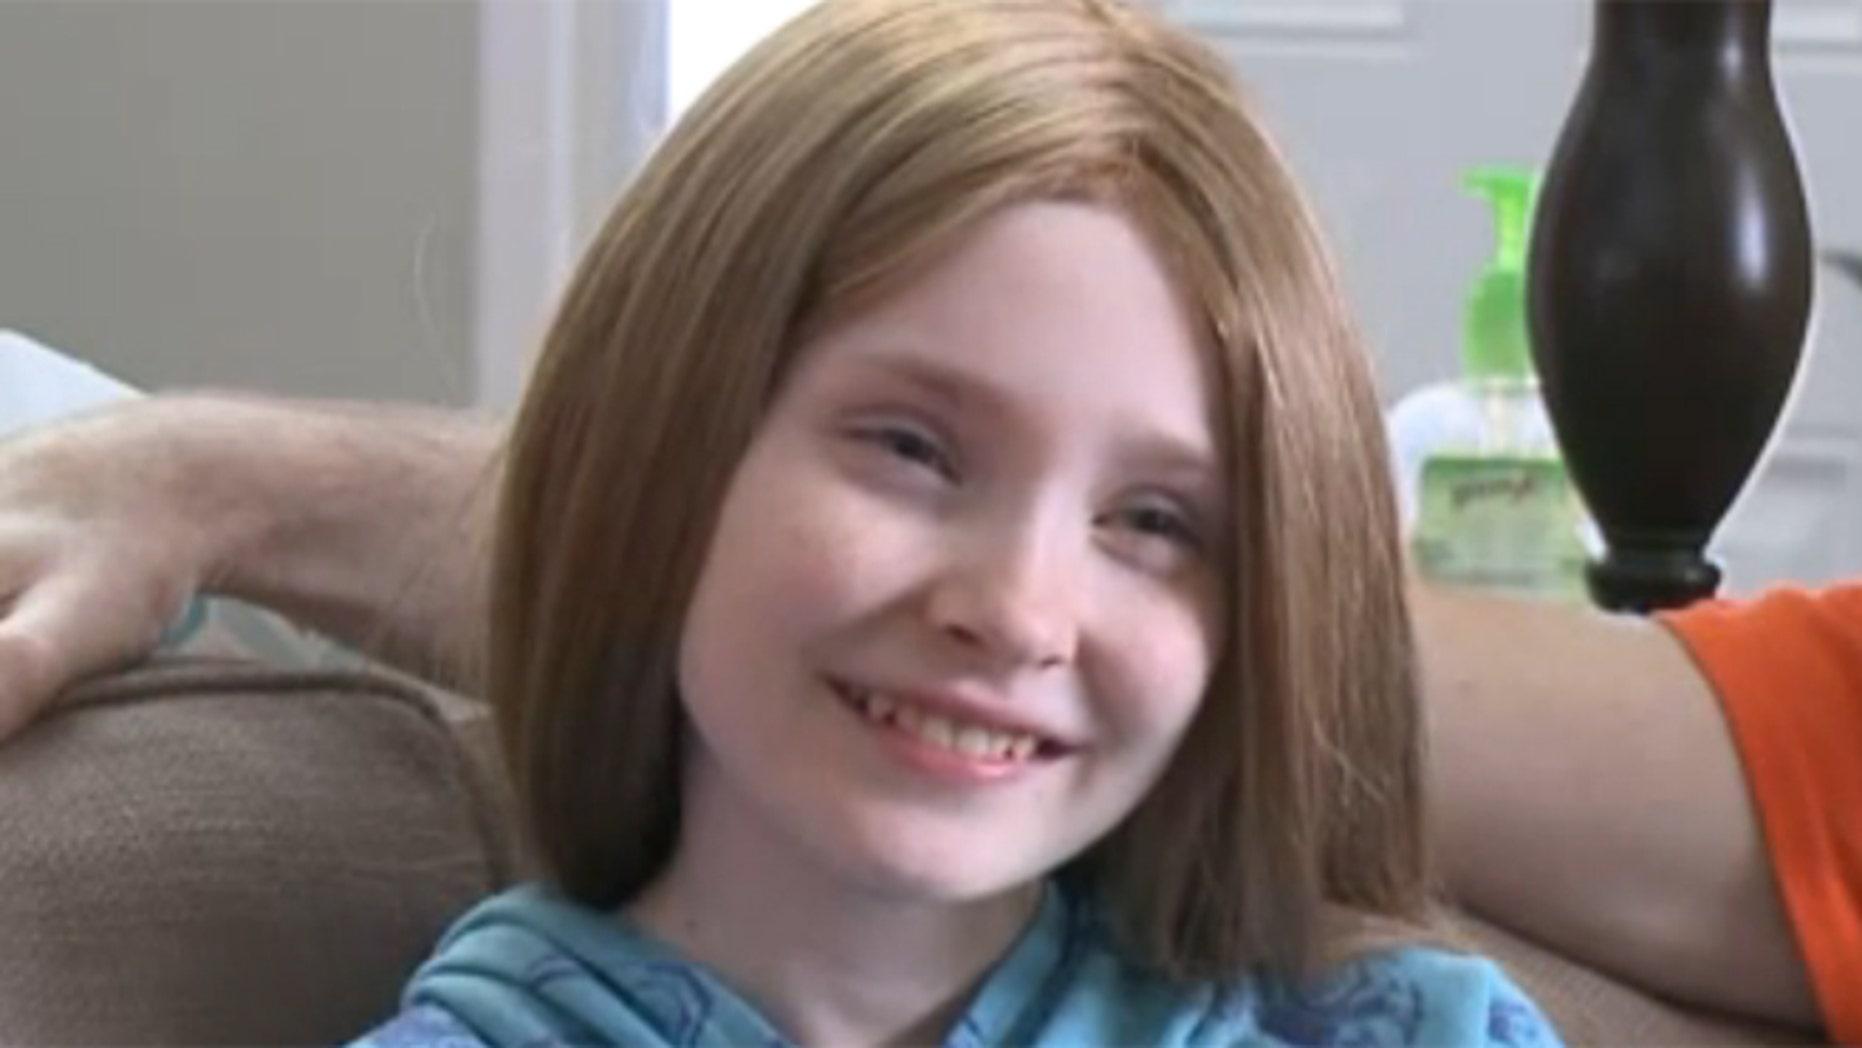 Mikayla Donahue is battling acute myeloid leukemia.